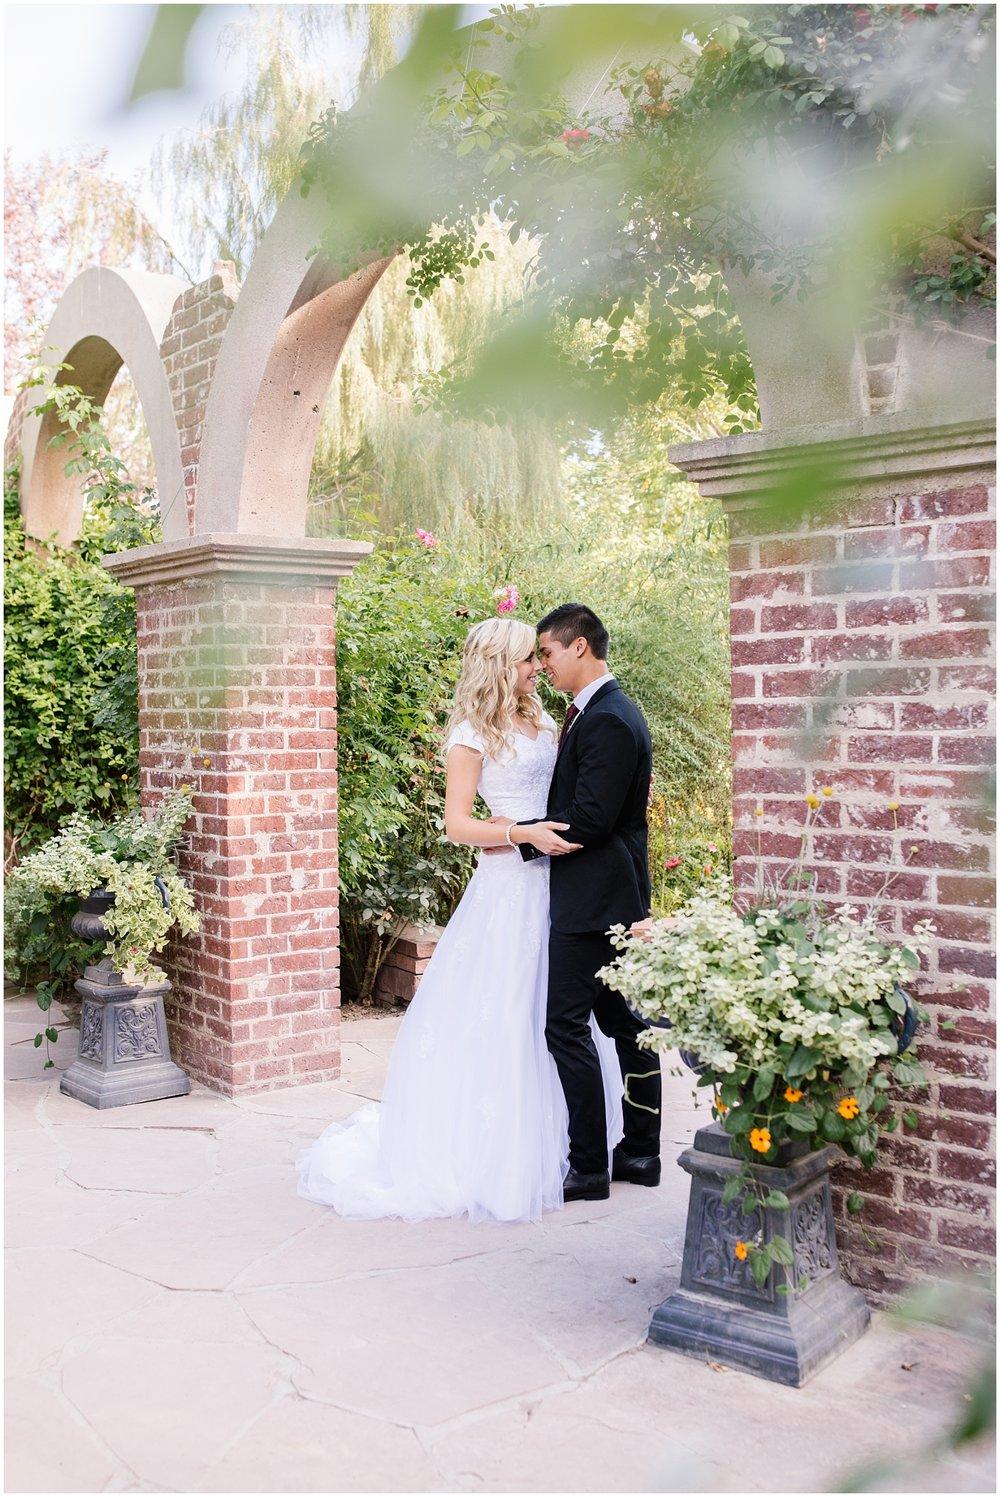 CHBridals-29_Lizzie-B-Imagery-Utah-Wedding-Photographer-Salt-Lake-City-Park-City-Thanksgiving-Point-Ashton-Gardens.jpg